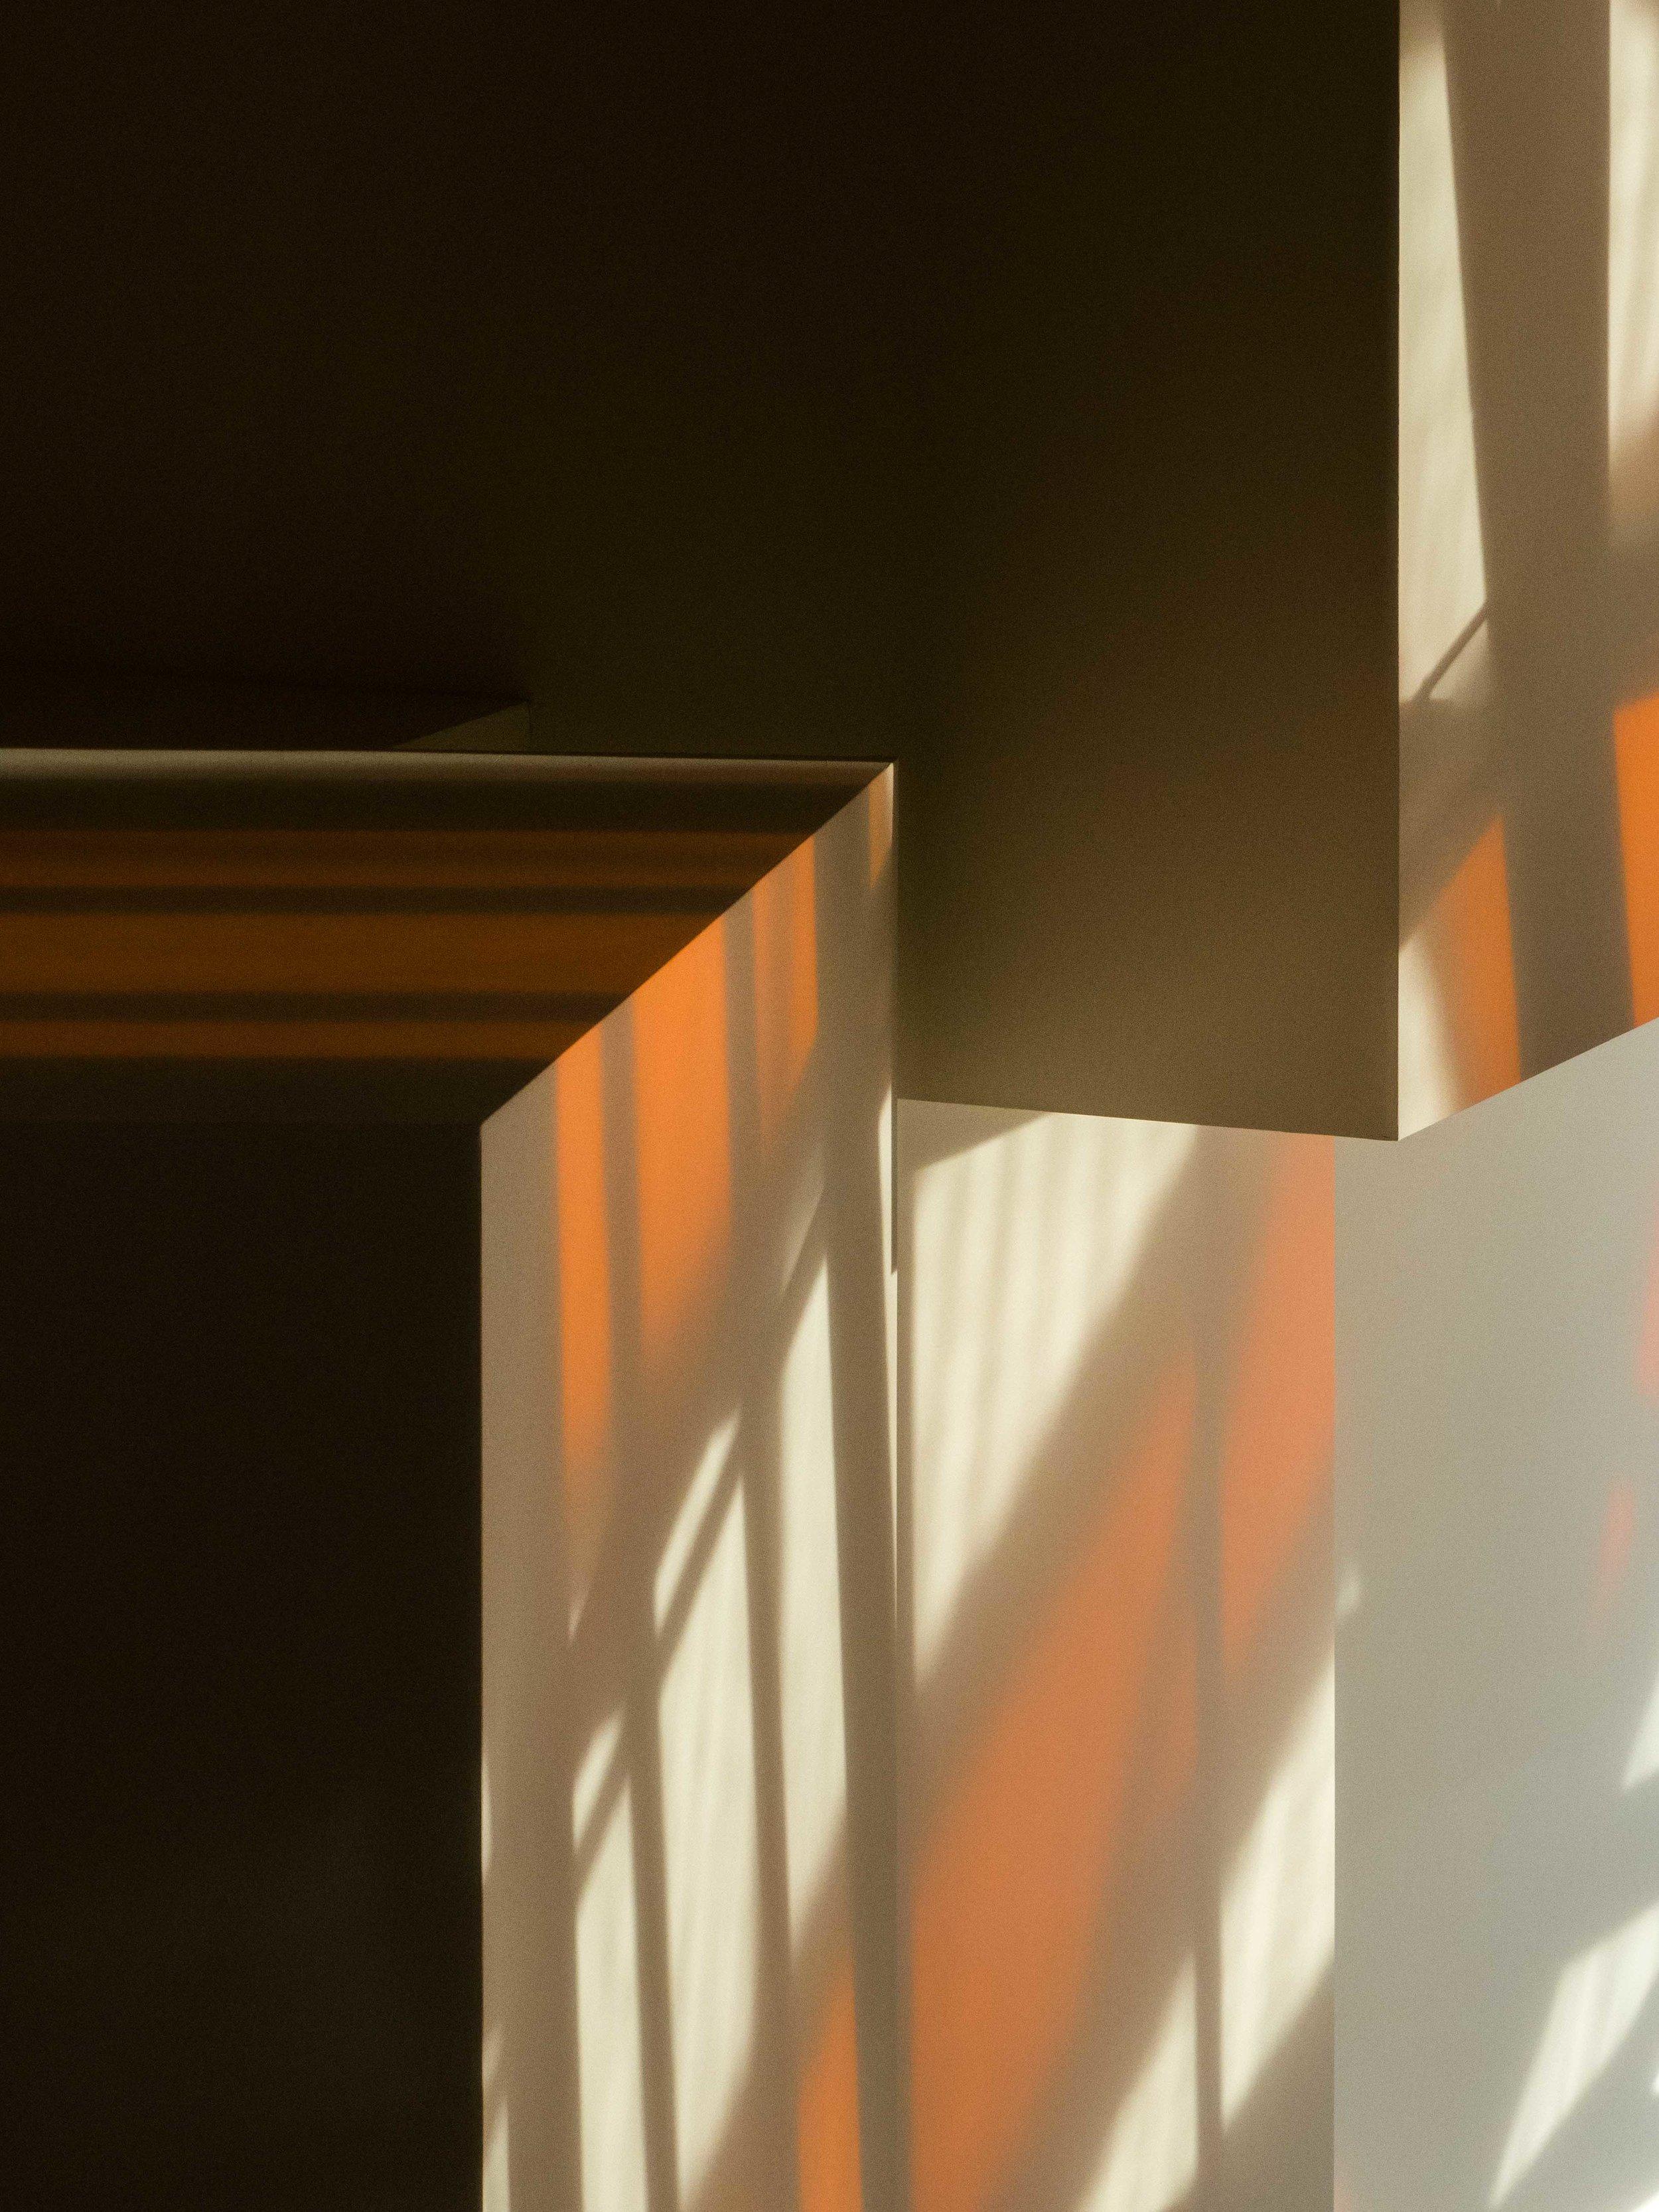 Fondation Louis Vuitton: Reflected Orange